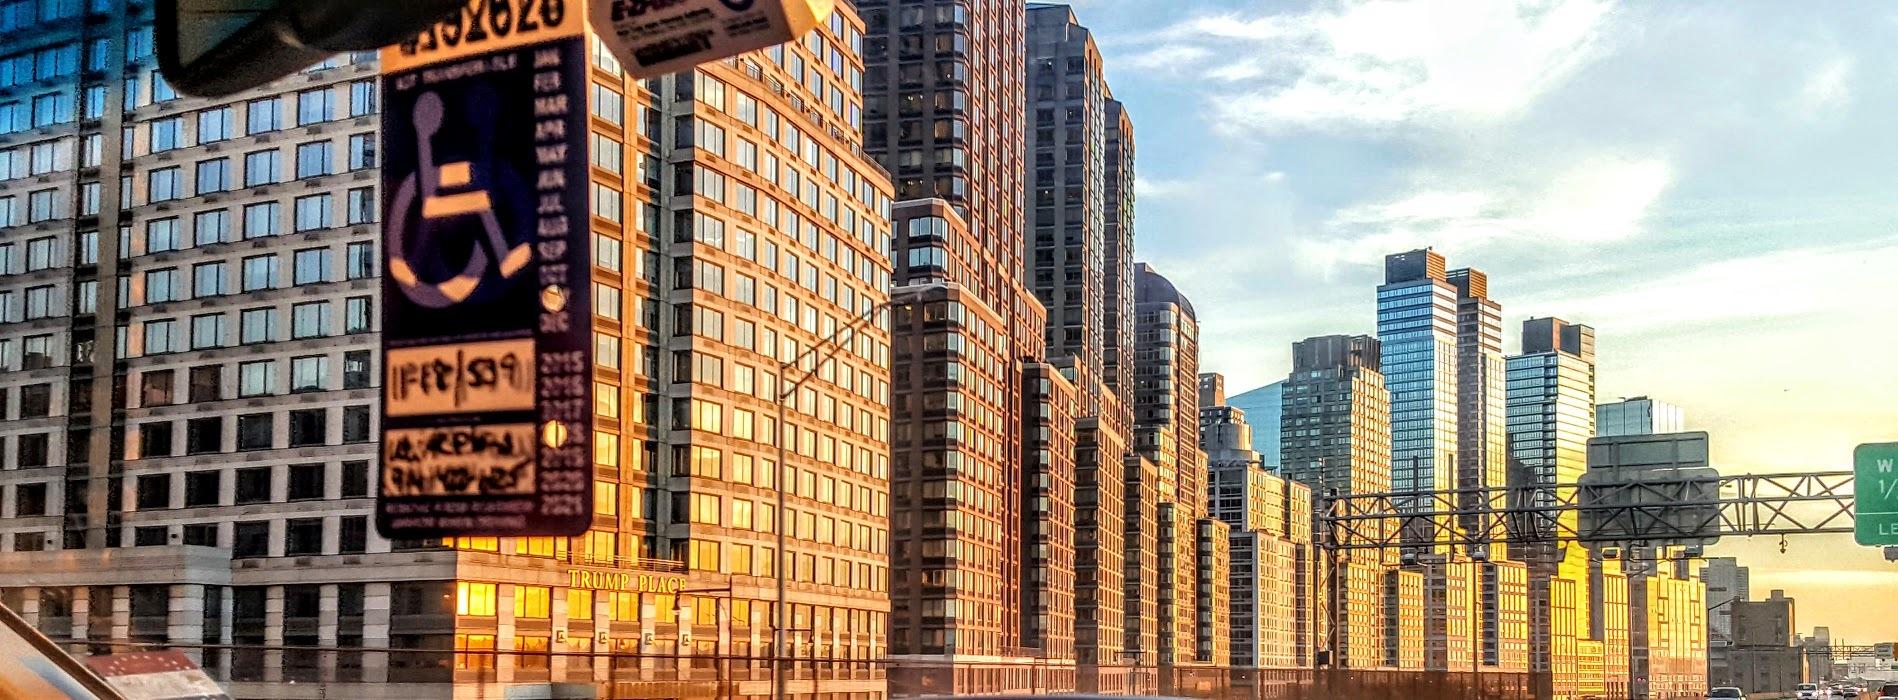 Trump Place - Upper West Side Highway by Matthew Albertell